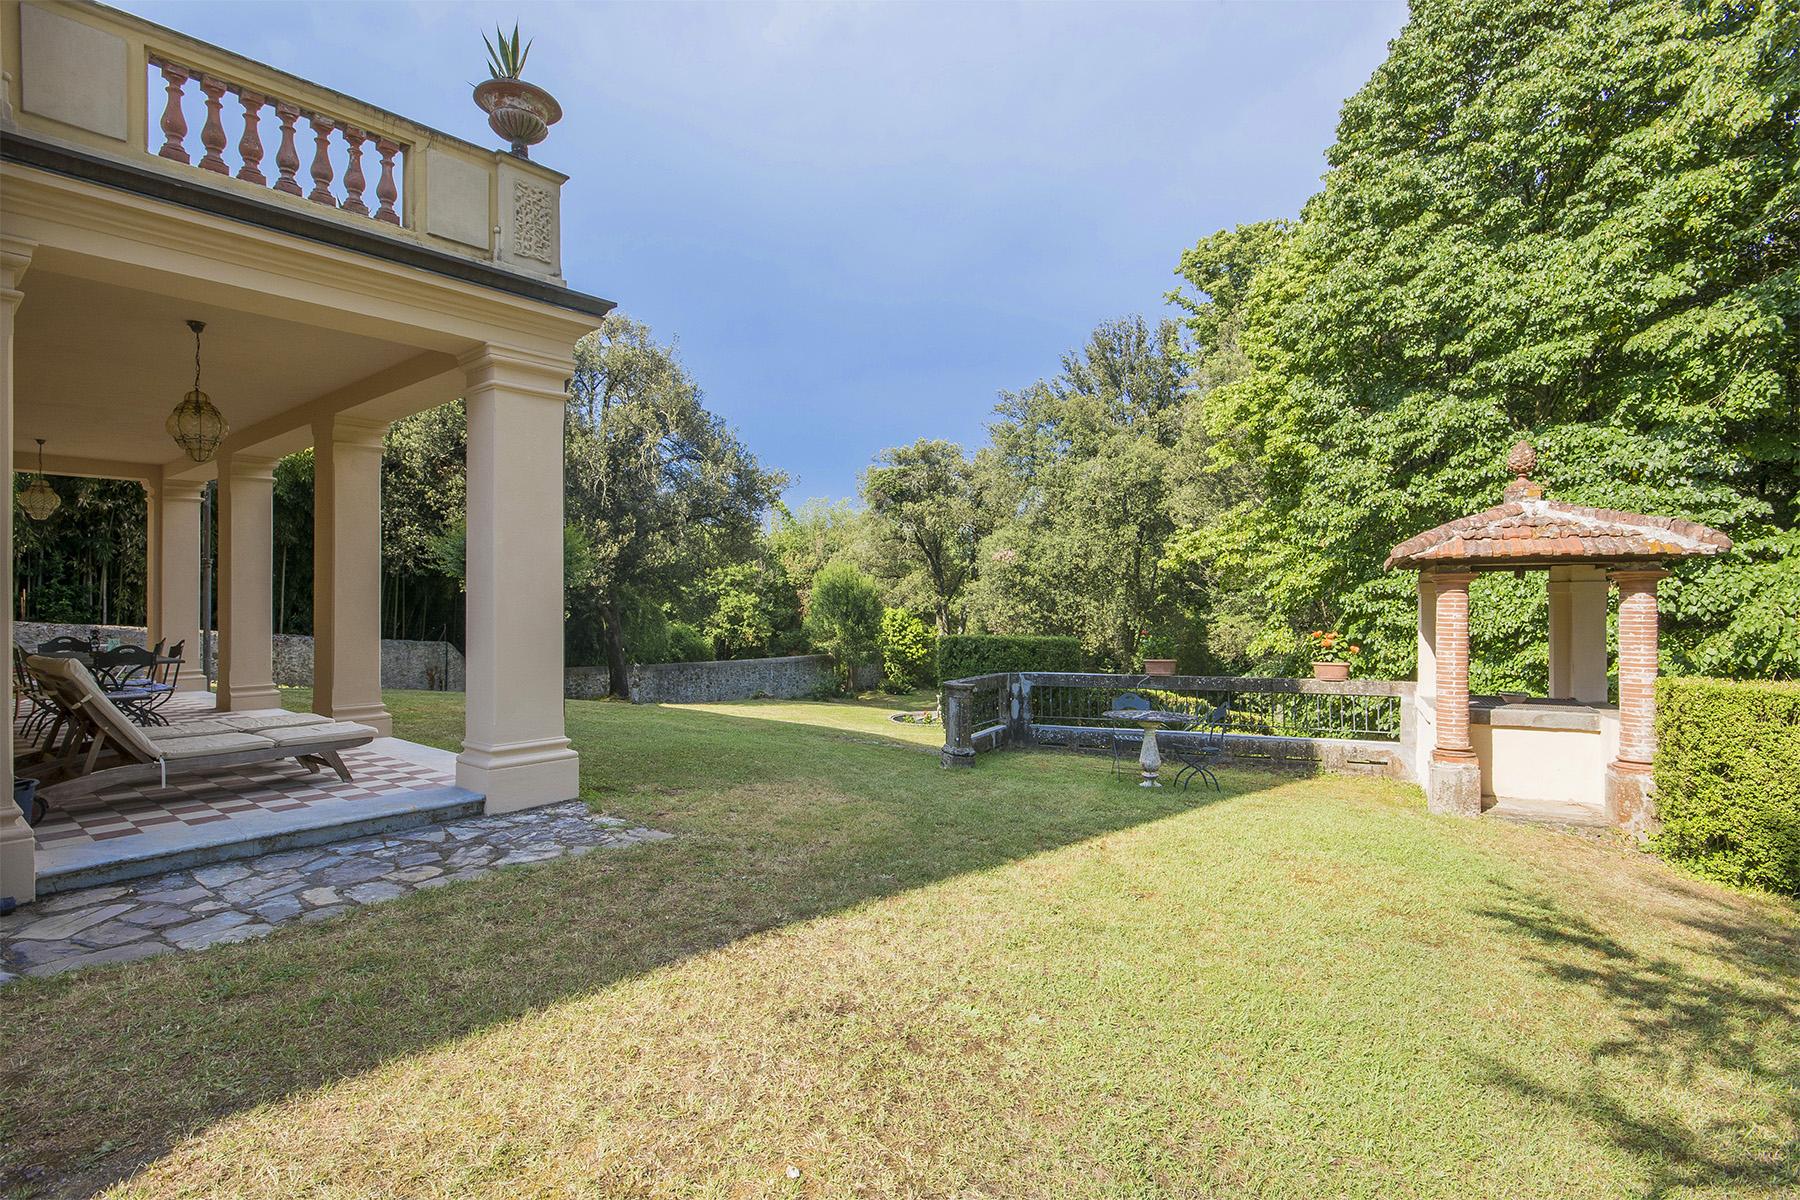 Villa in Vendita a Lucca: 5 locali, 1150 mq - Foto 14